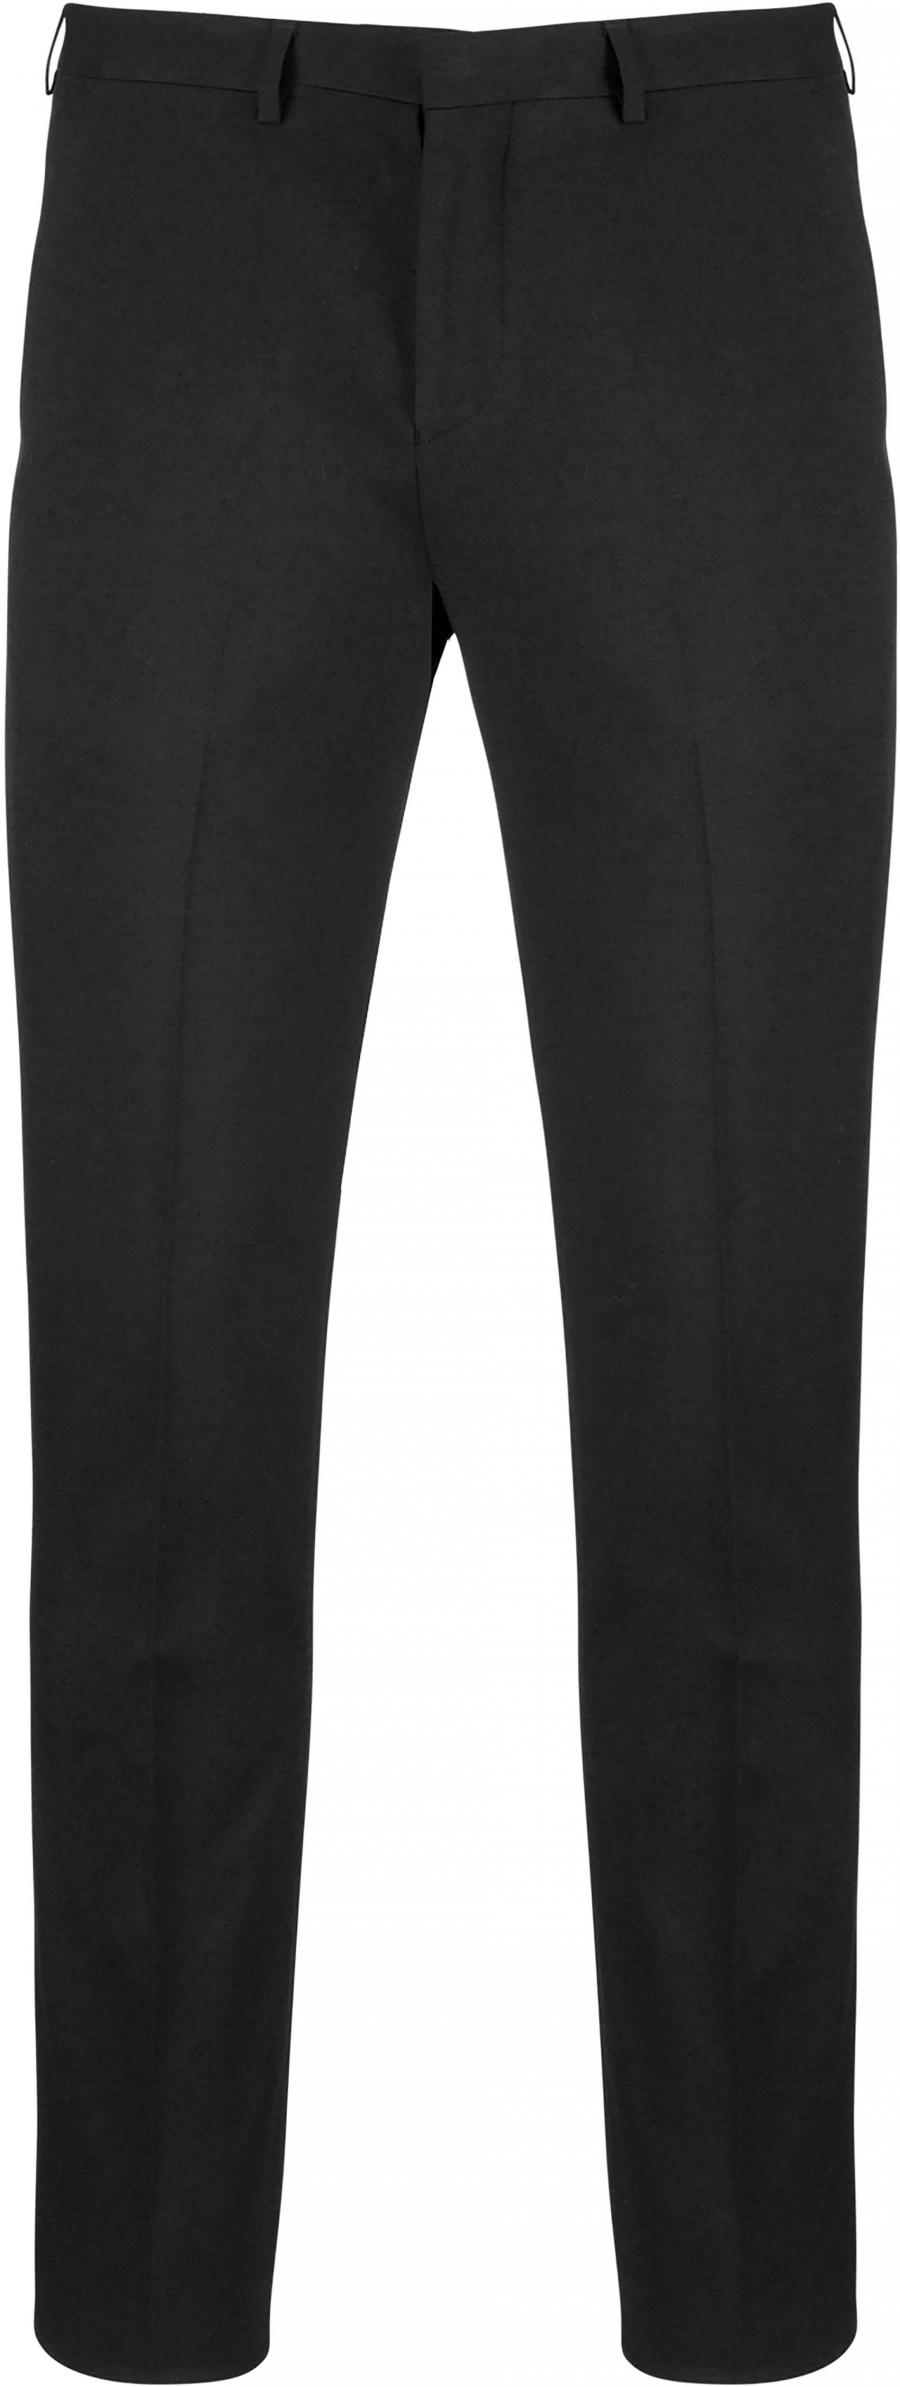 Pantalon homme - 2-1491-3